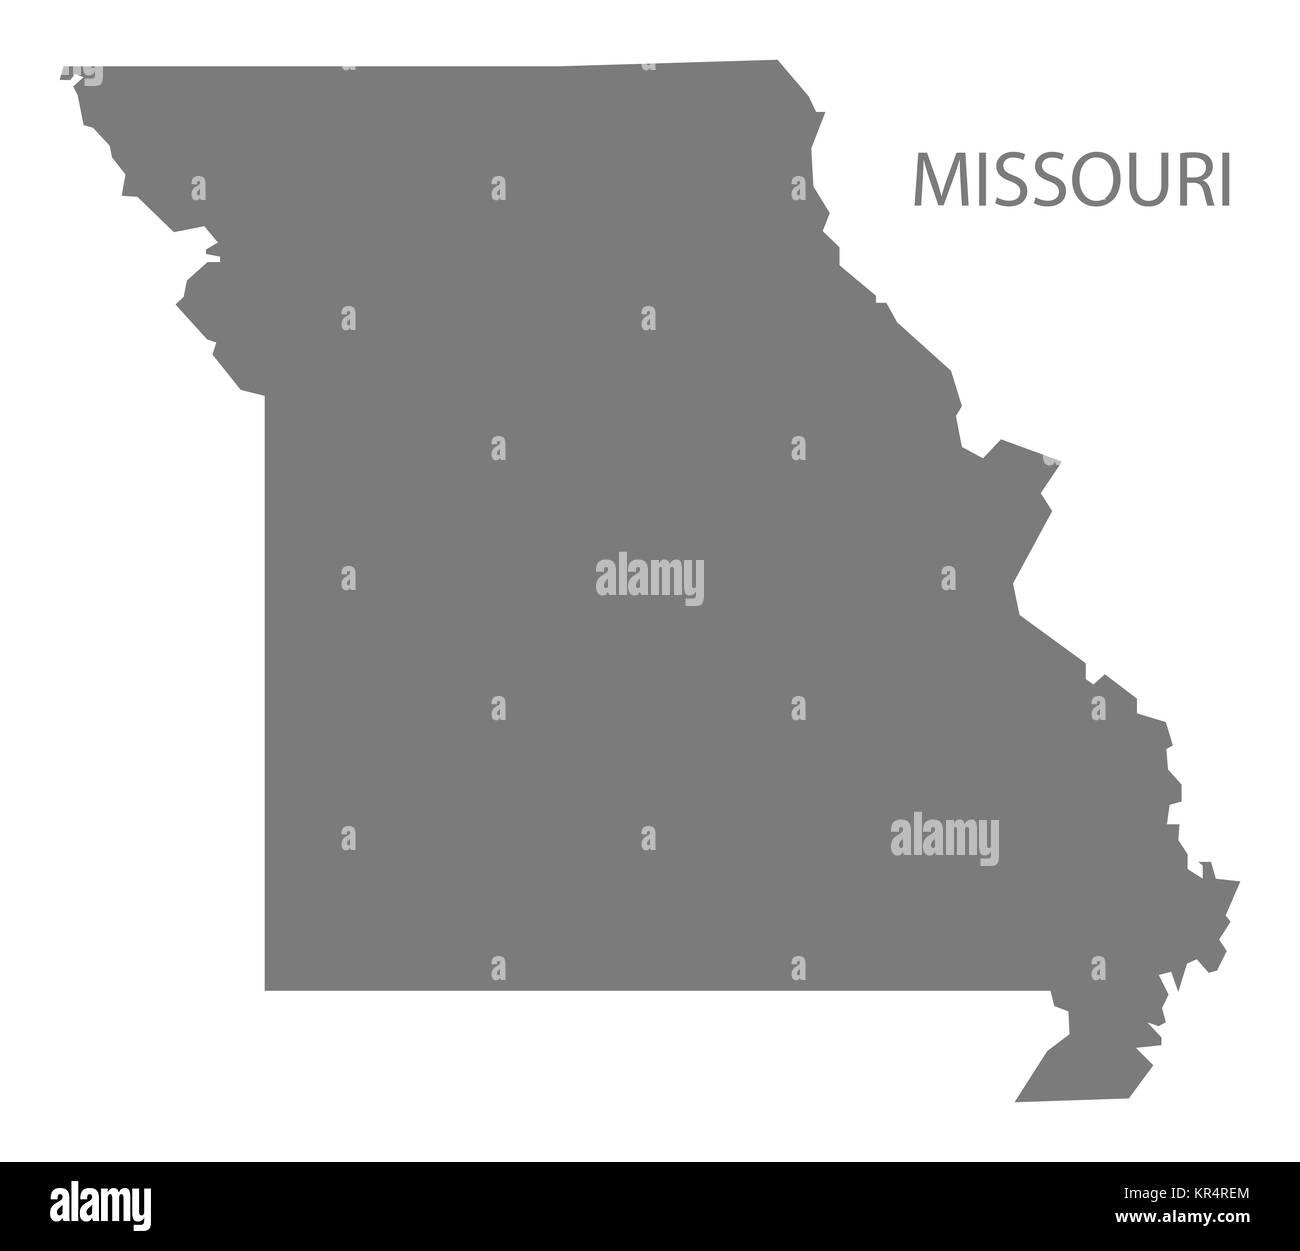 Missouri USA Map In Grey Stock Photo Royalty Free Image - Missouri usa map